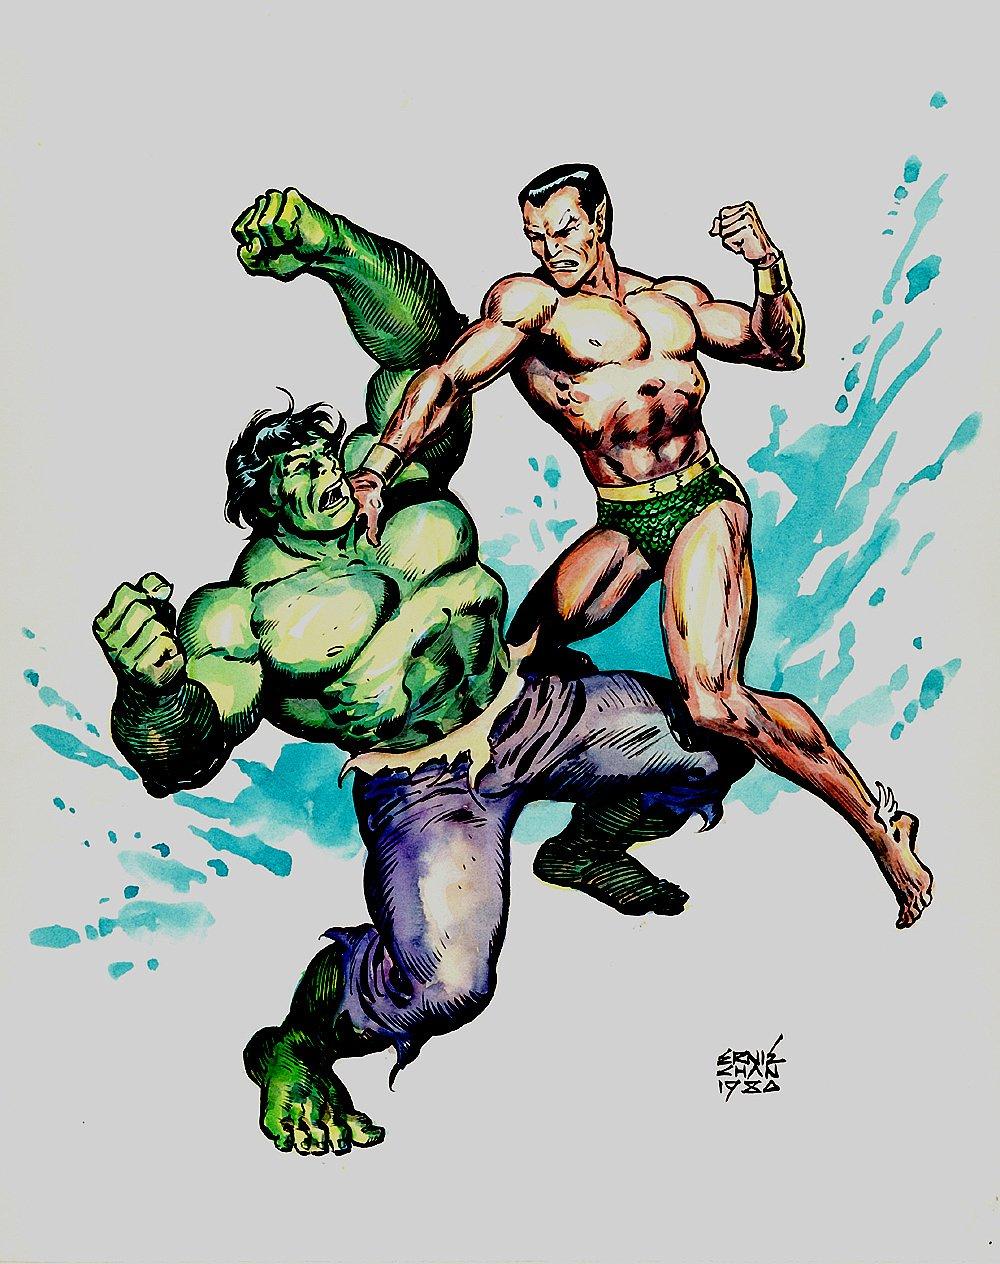 The Incredible Hulk Vs The Sub-Mariner Hand Colored Pinup (1980)